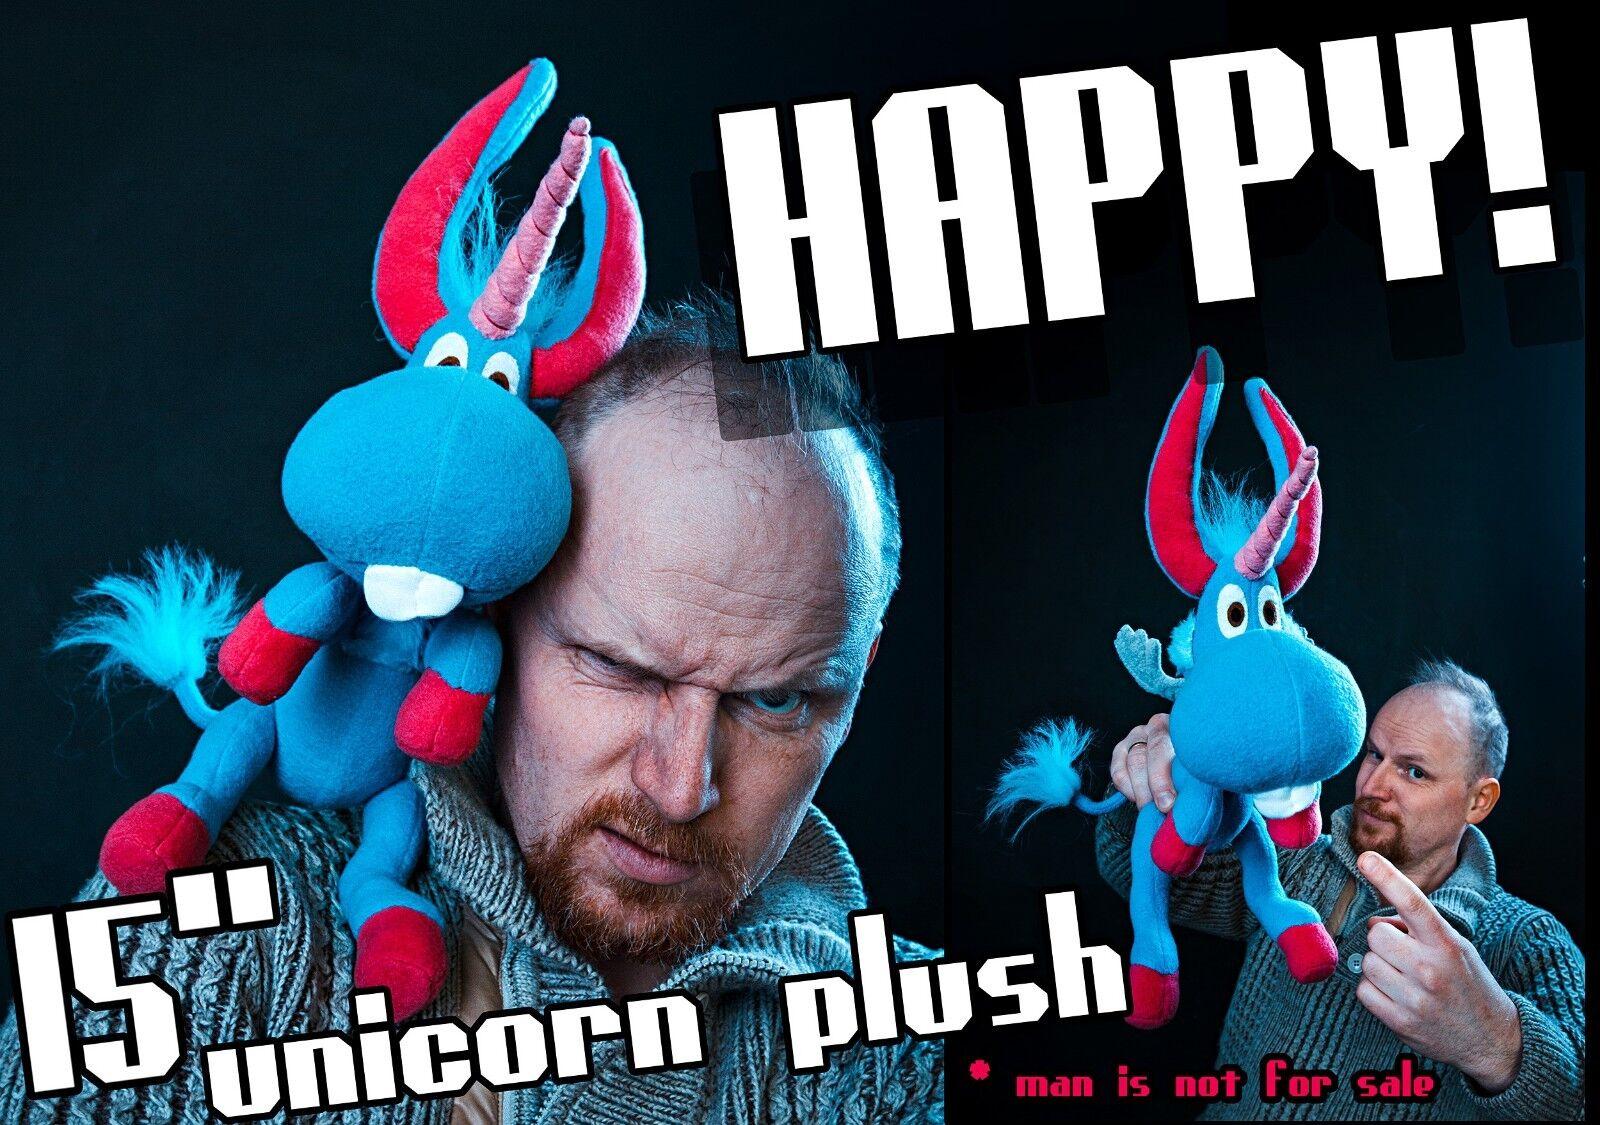 Happy Unicorn Plush handmade toy , 15 in high, Happy  Syfy inspiROT doll